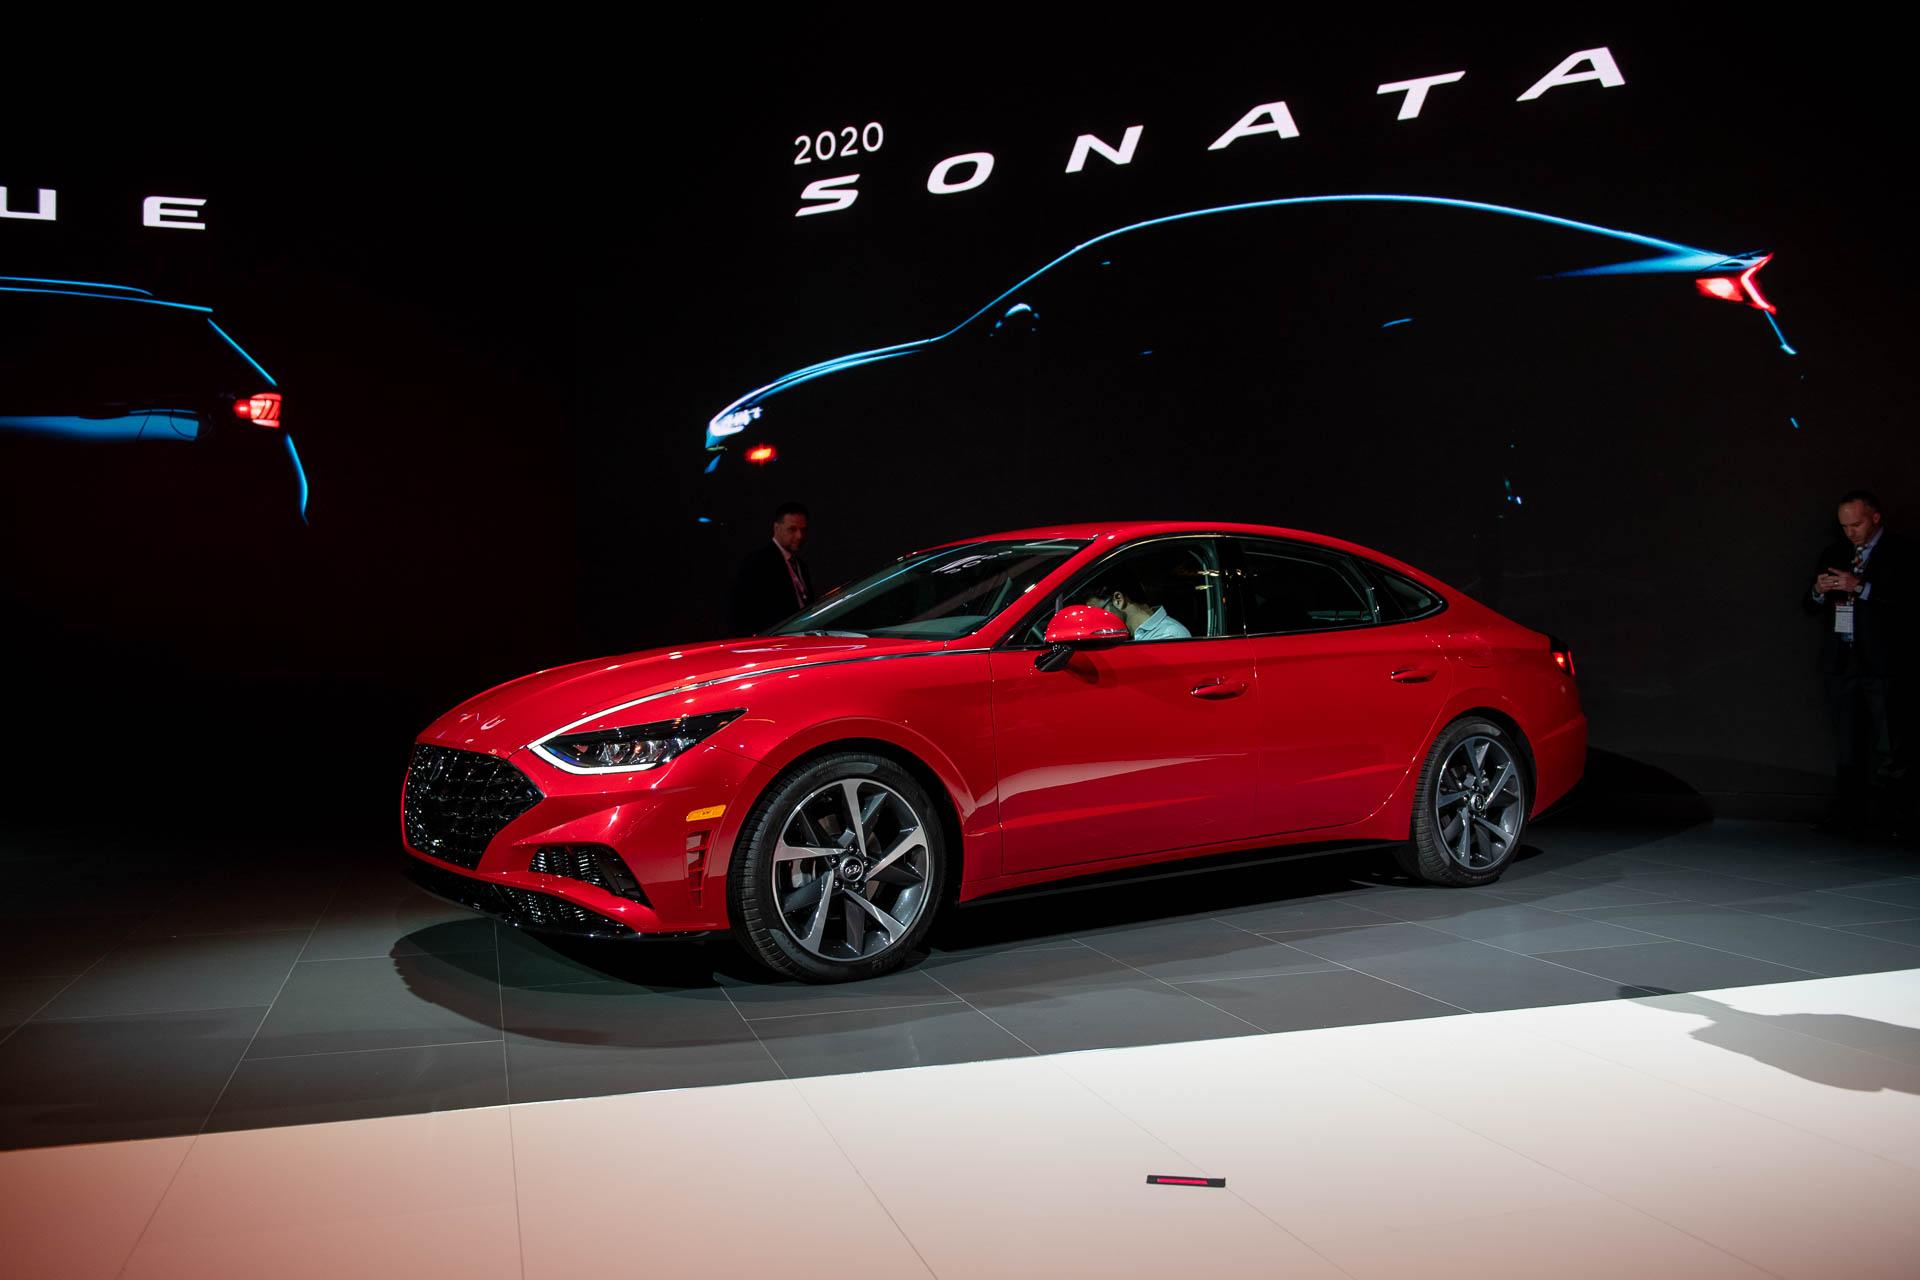 2020 Hyundai Sonata ready to shine brightly